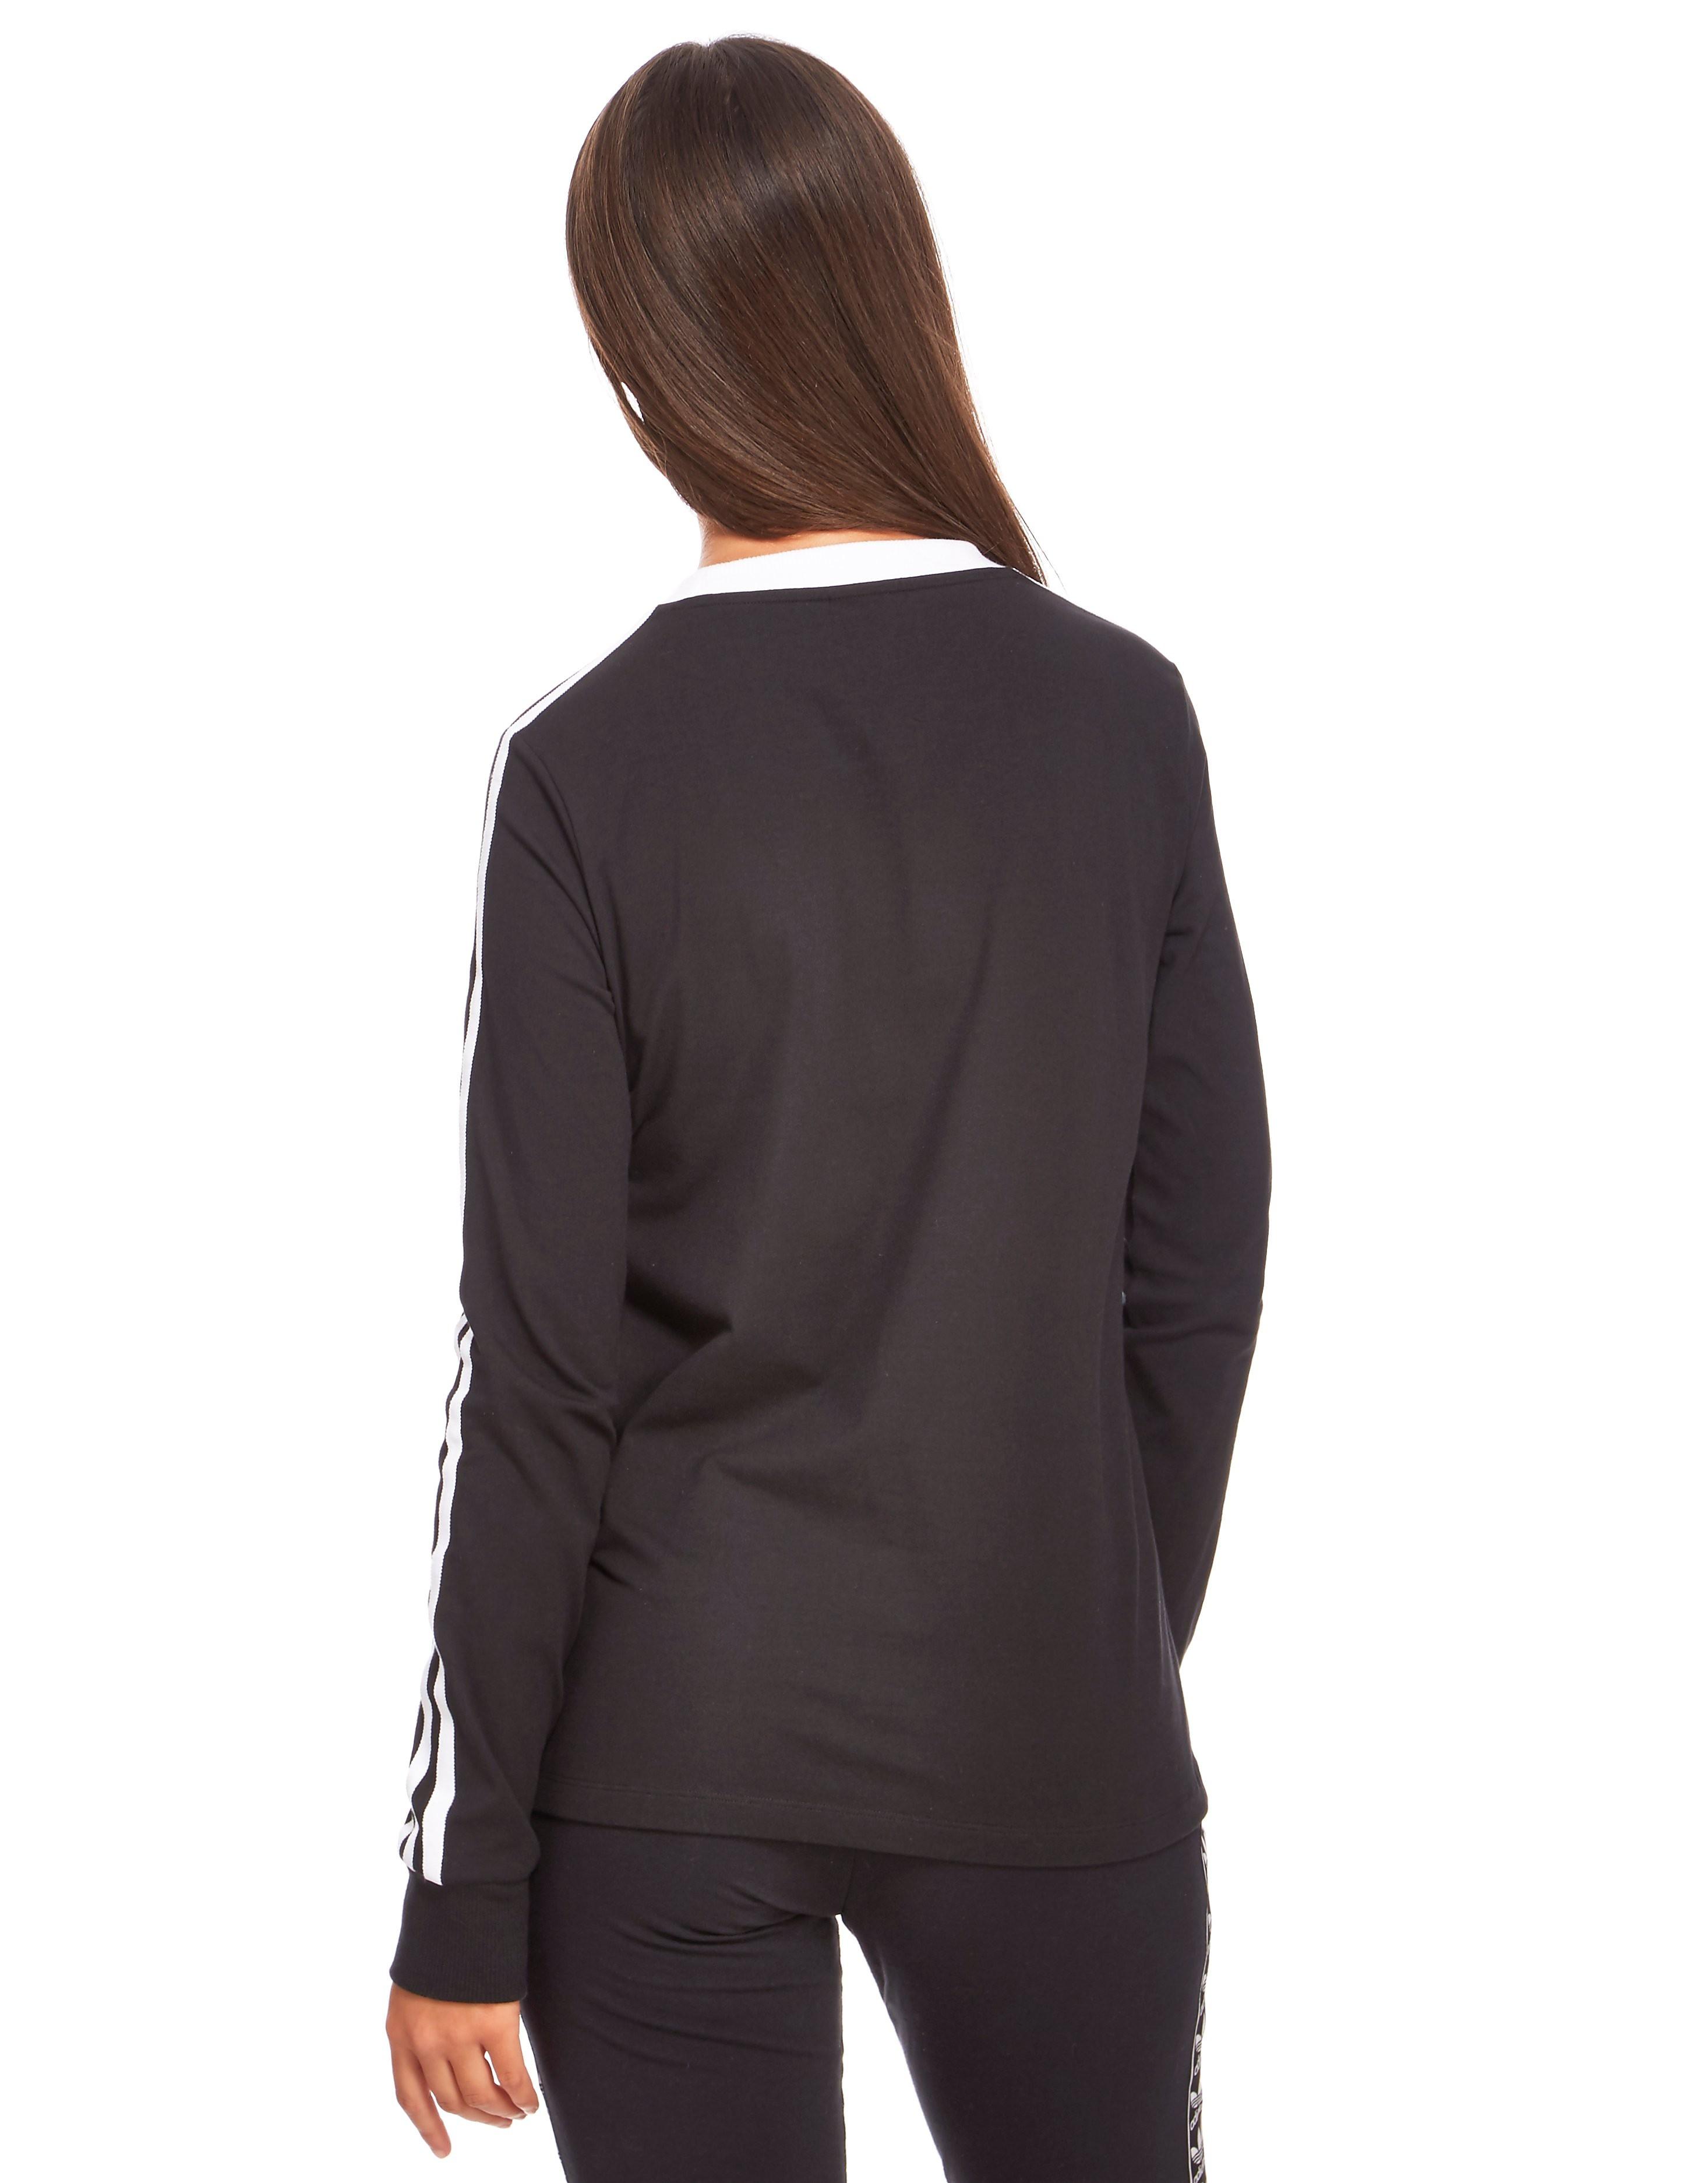 adidas Originals 3 Stripes Long-Sleeved T-Shirt